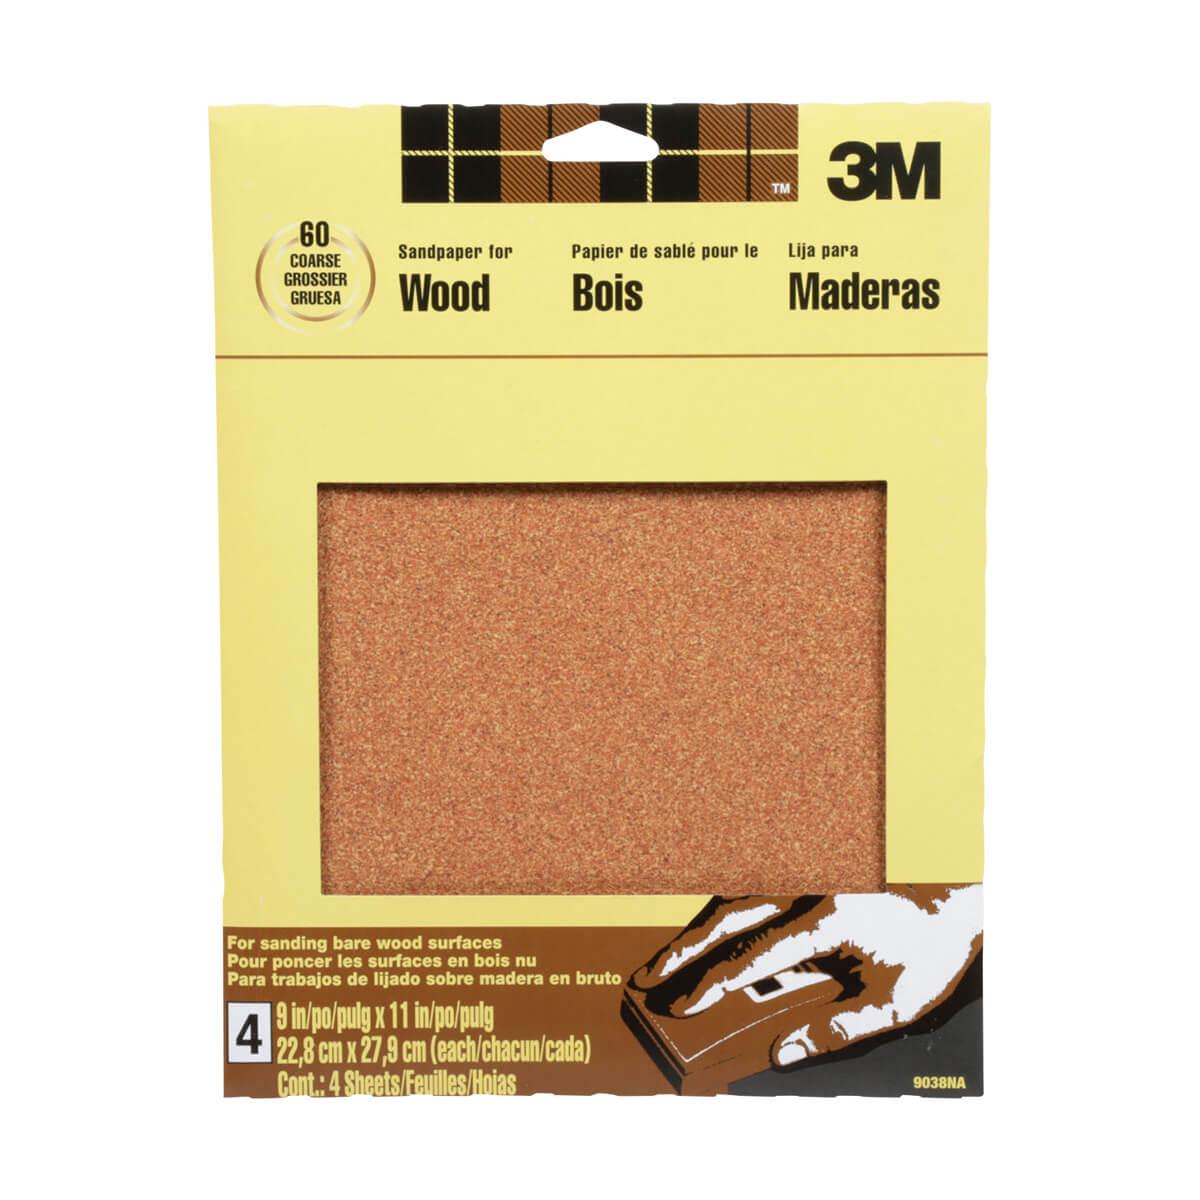 3M Garnet Sandpaper - 4 pack, 60 Grit